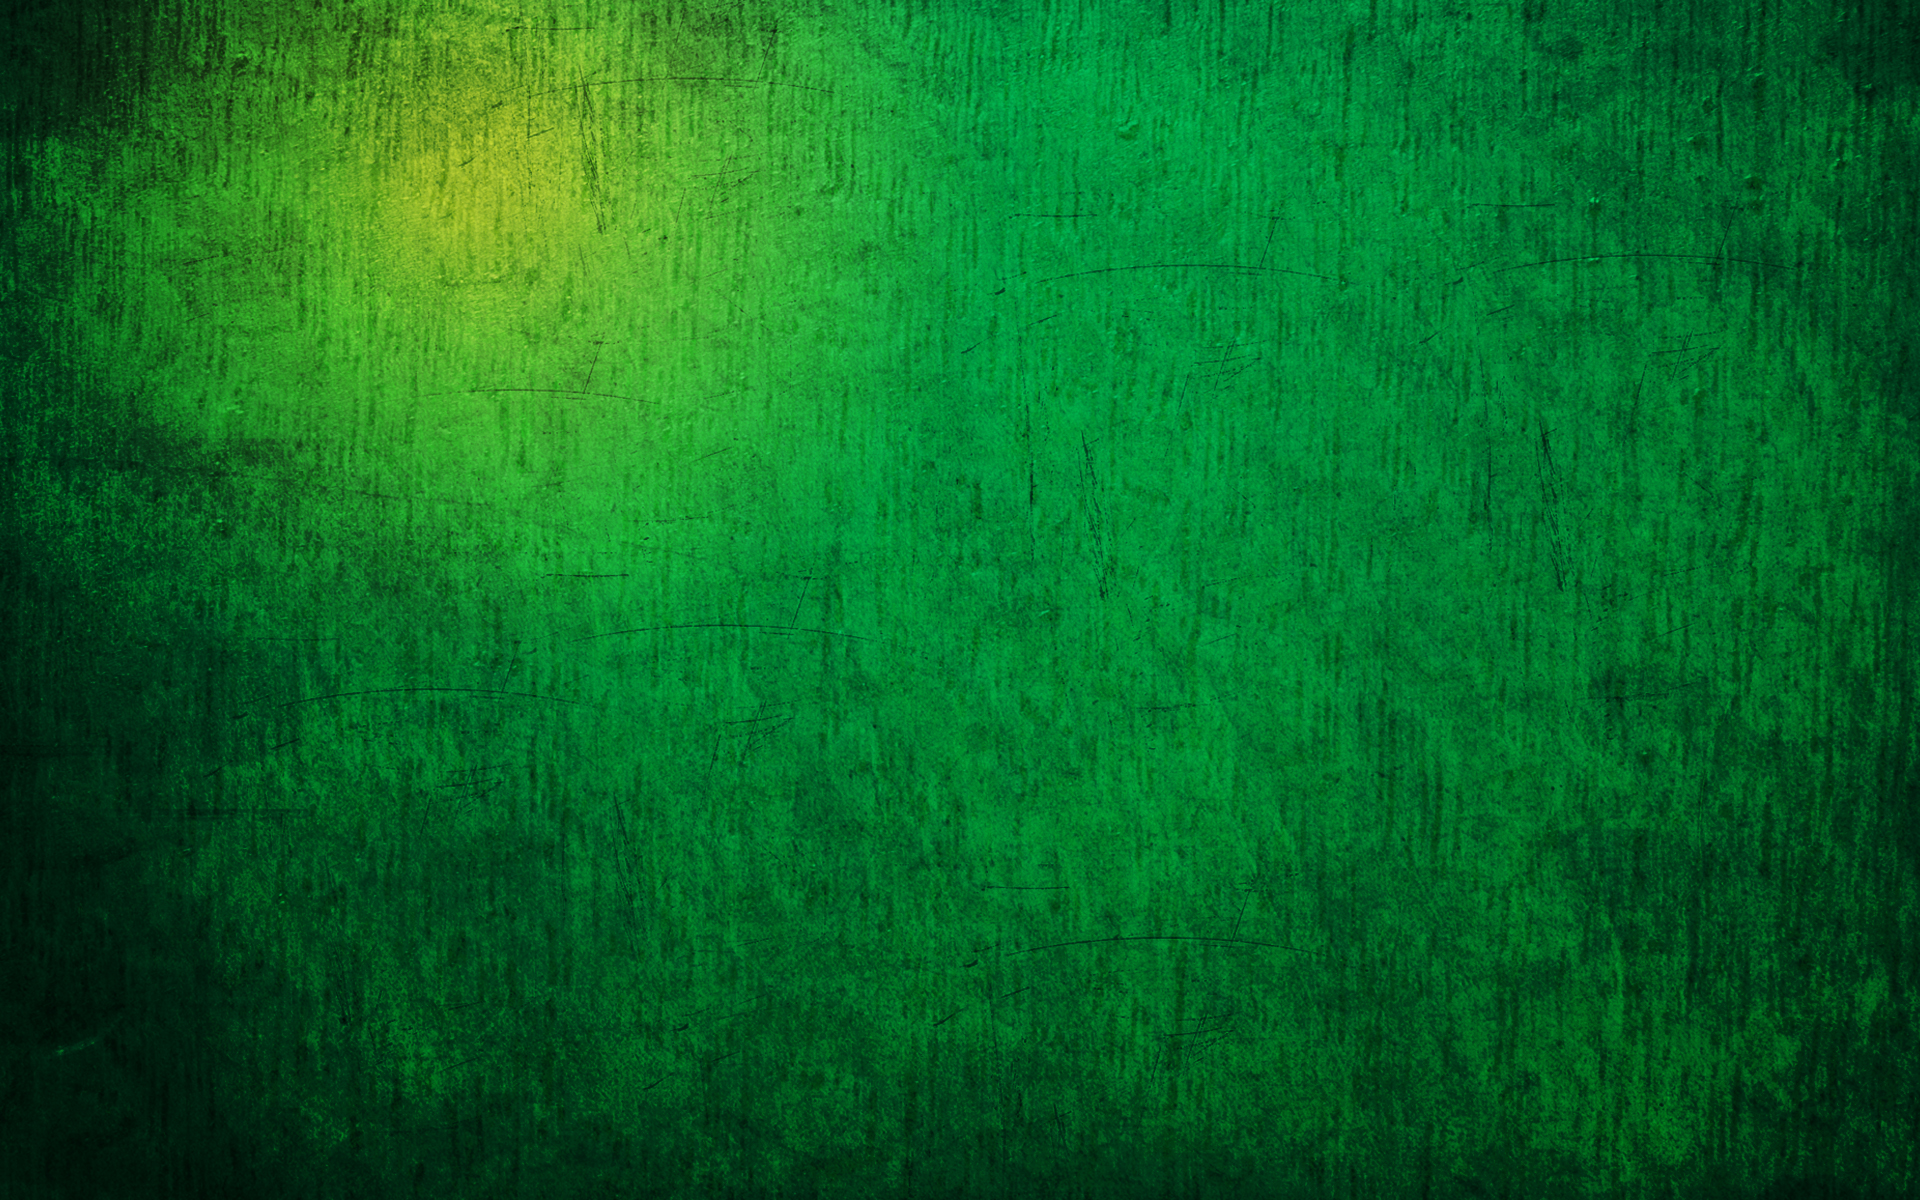 green background 21869